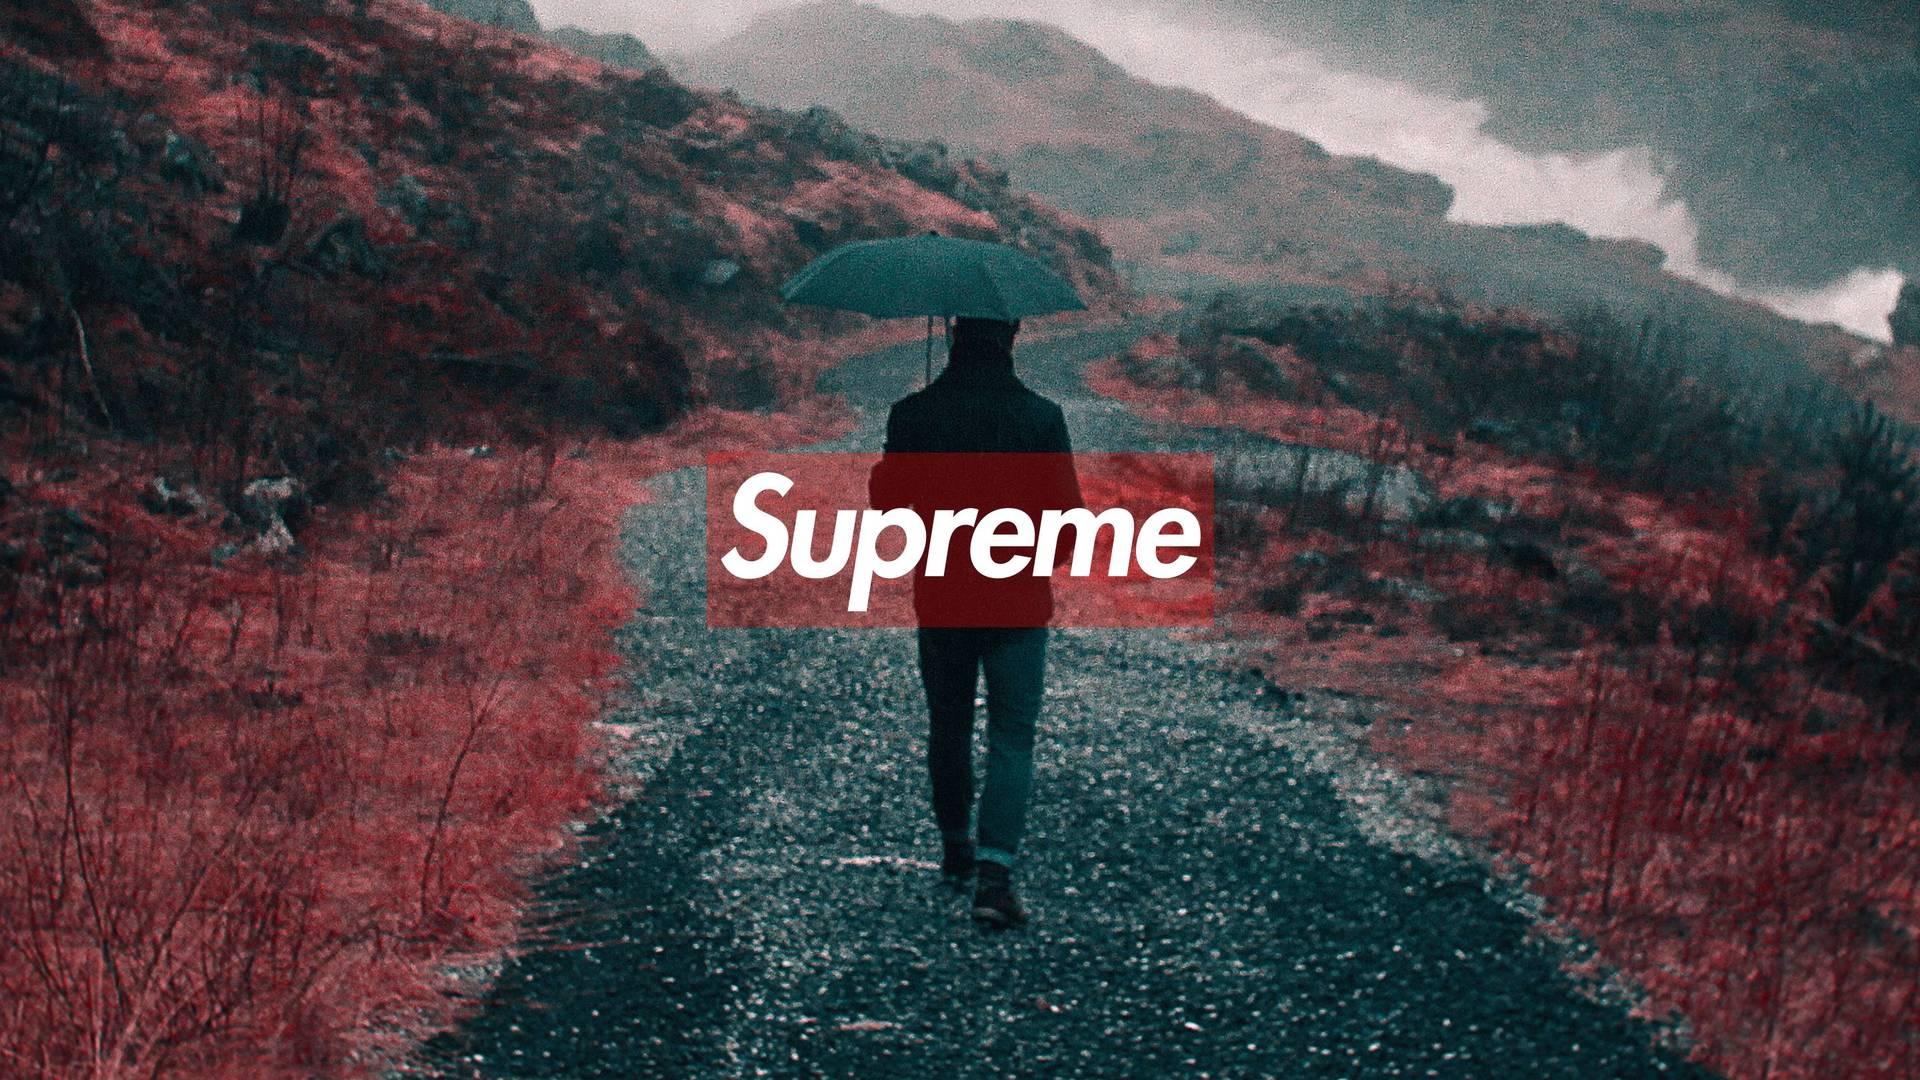 Supreme Laptop Wallpapers - Top Free Supreme Laptop